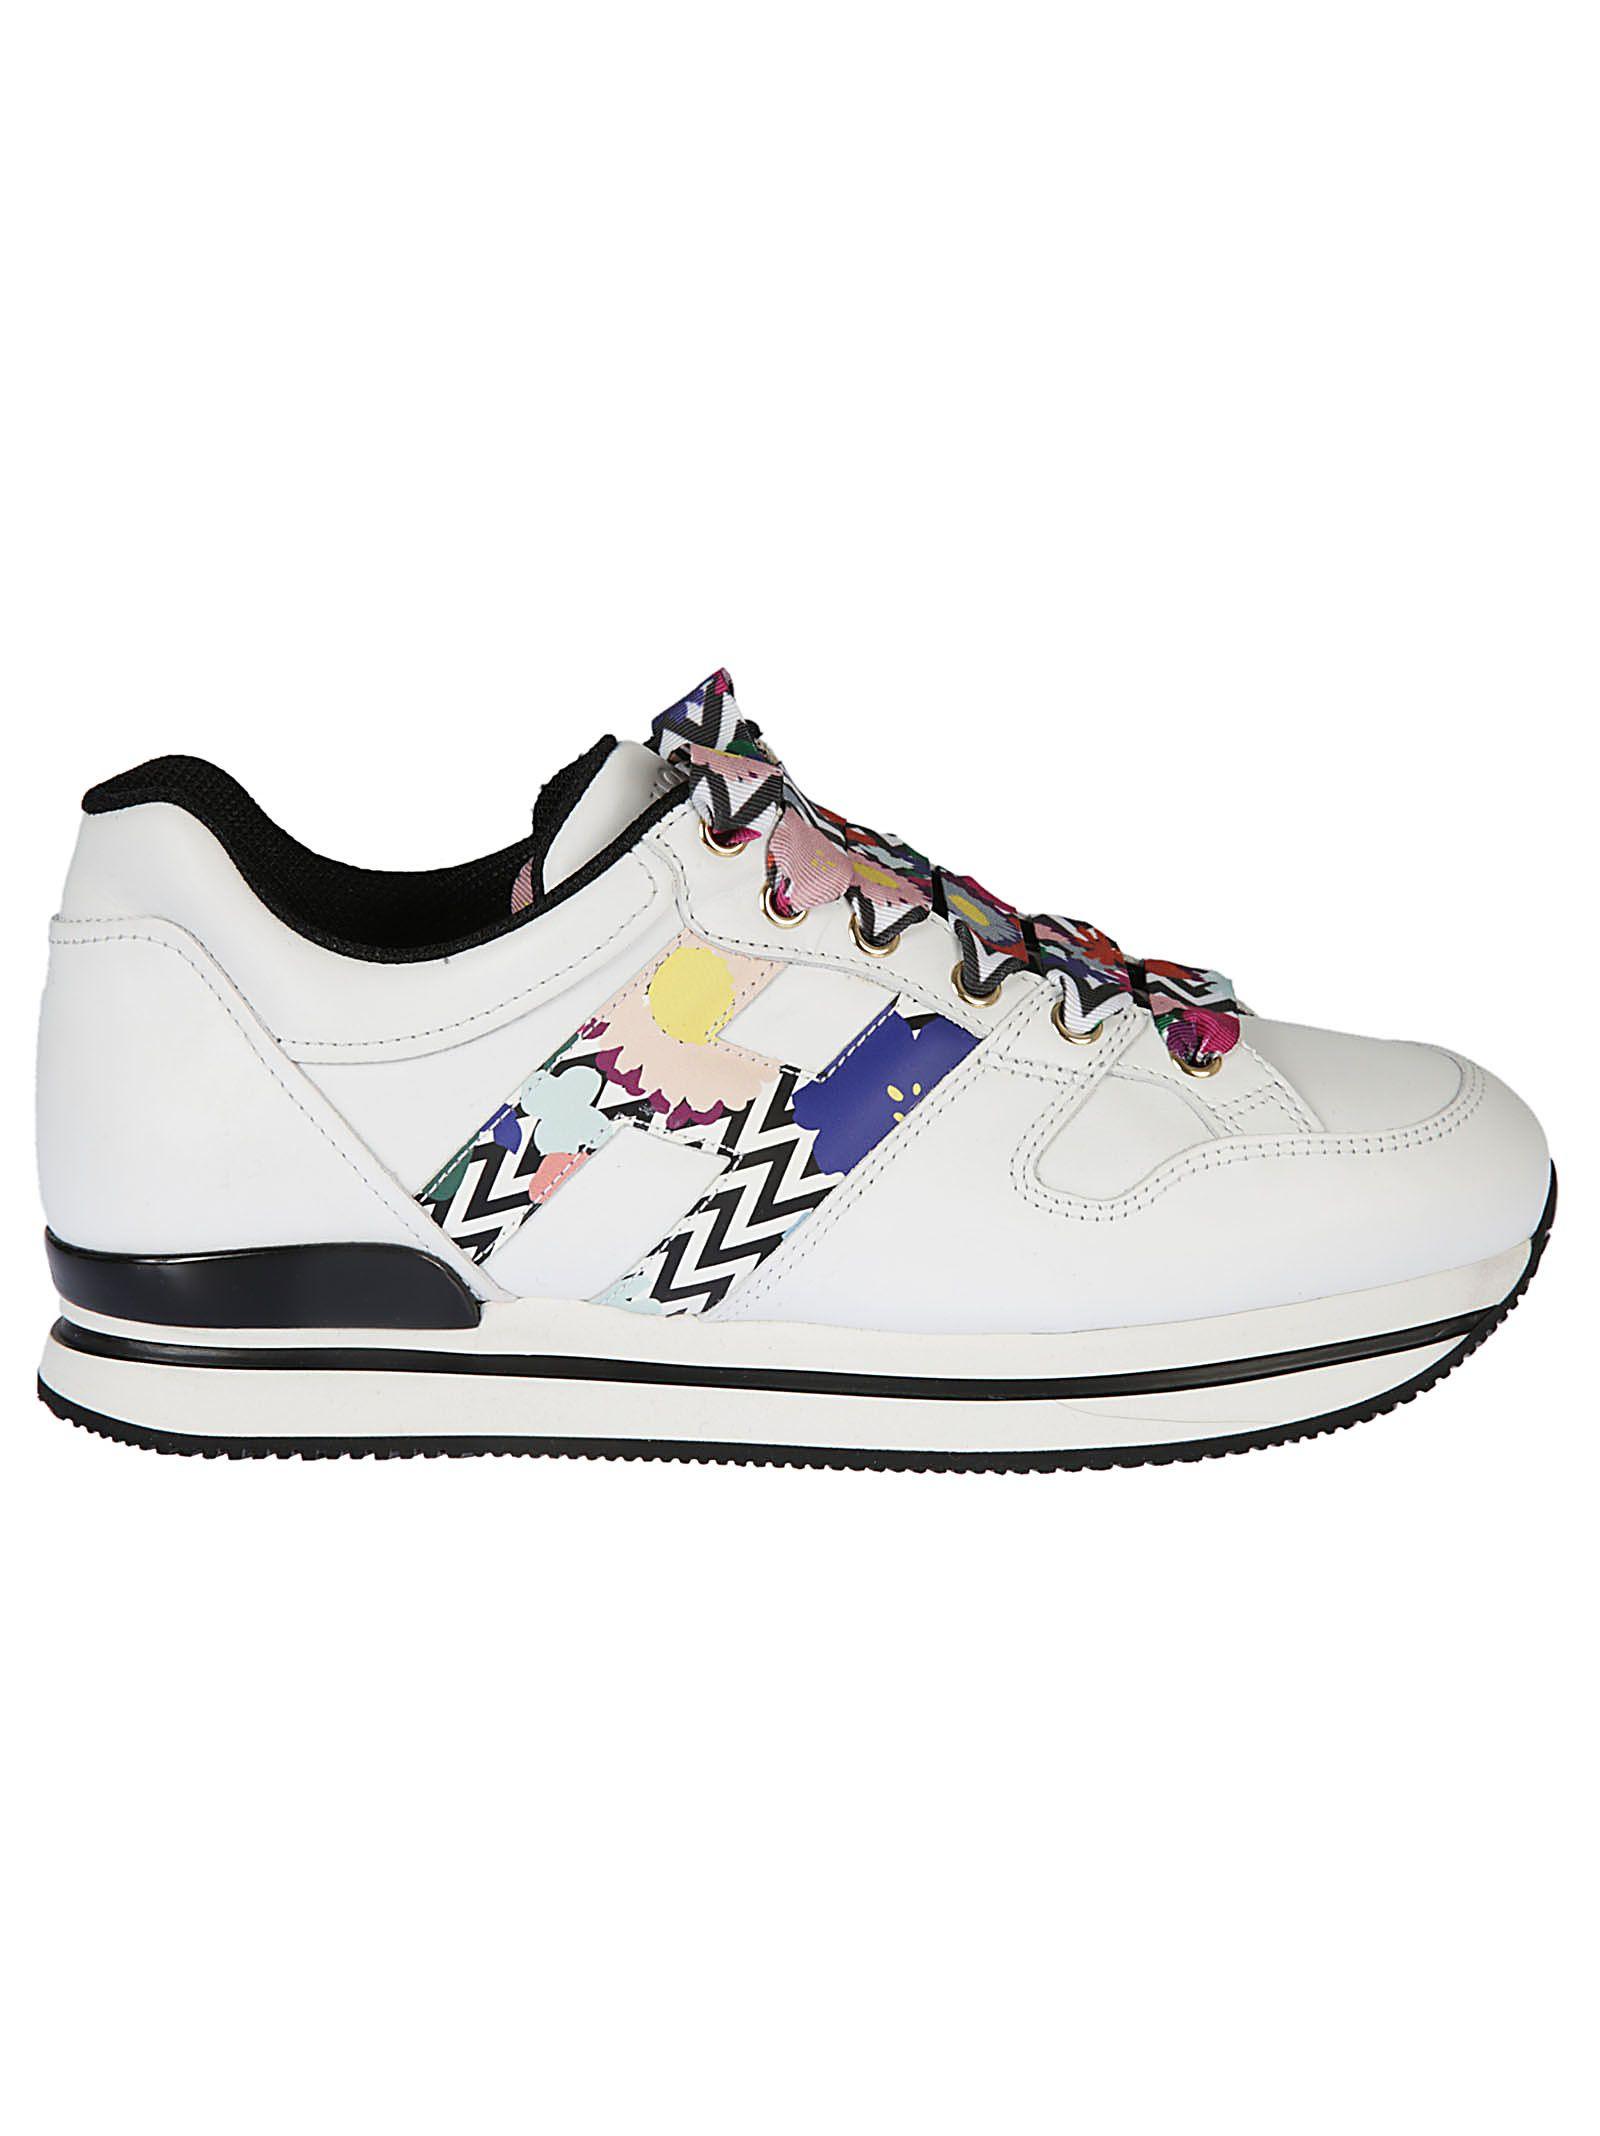 Venta Barata Almacenista Geniue Off-White floral print sneakers - Bianco Comprar Barato 100% Garantizada Barato WKTupVt8x